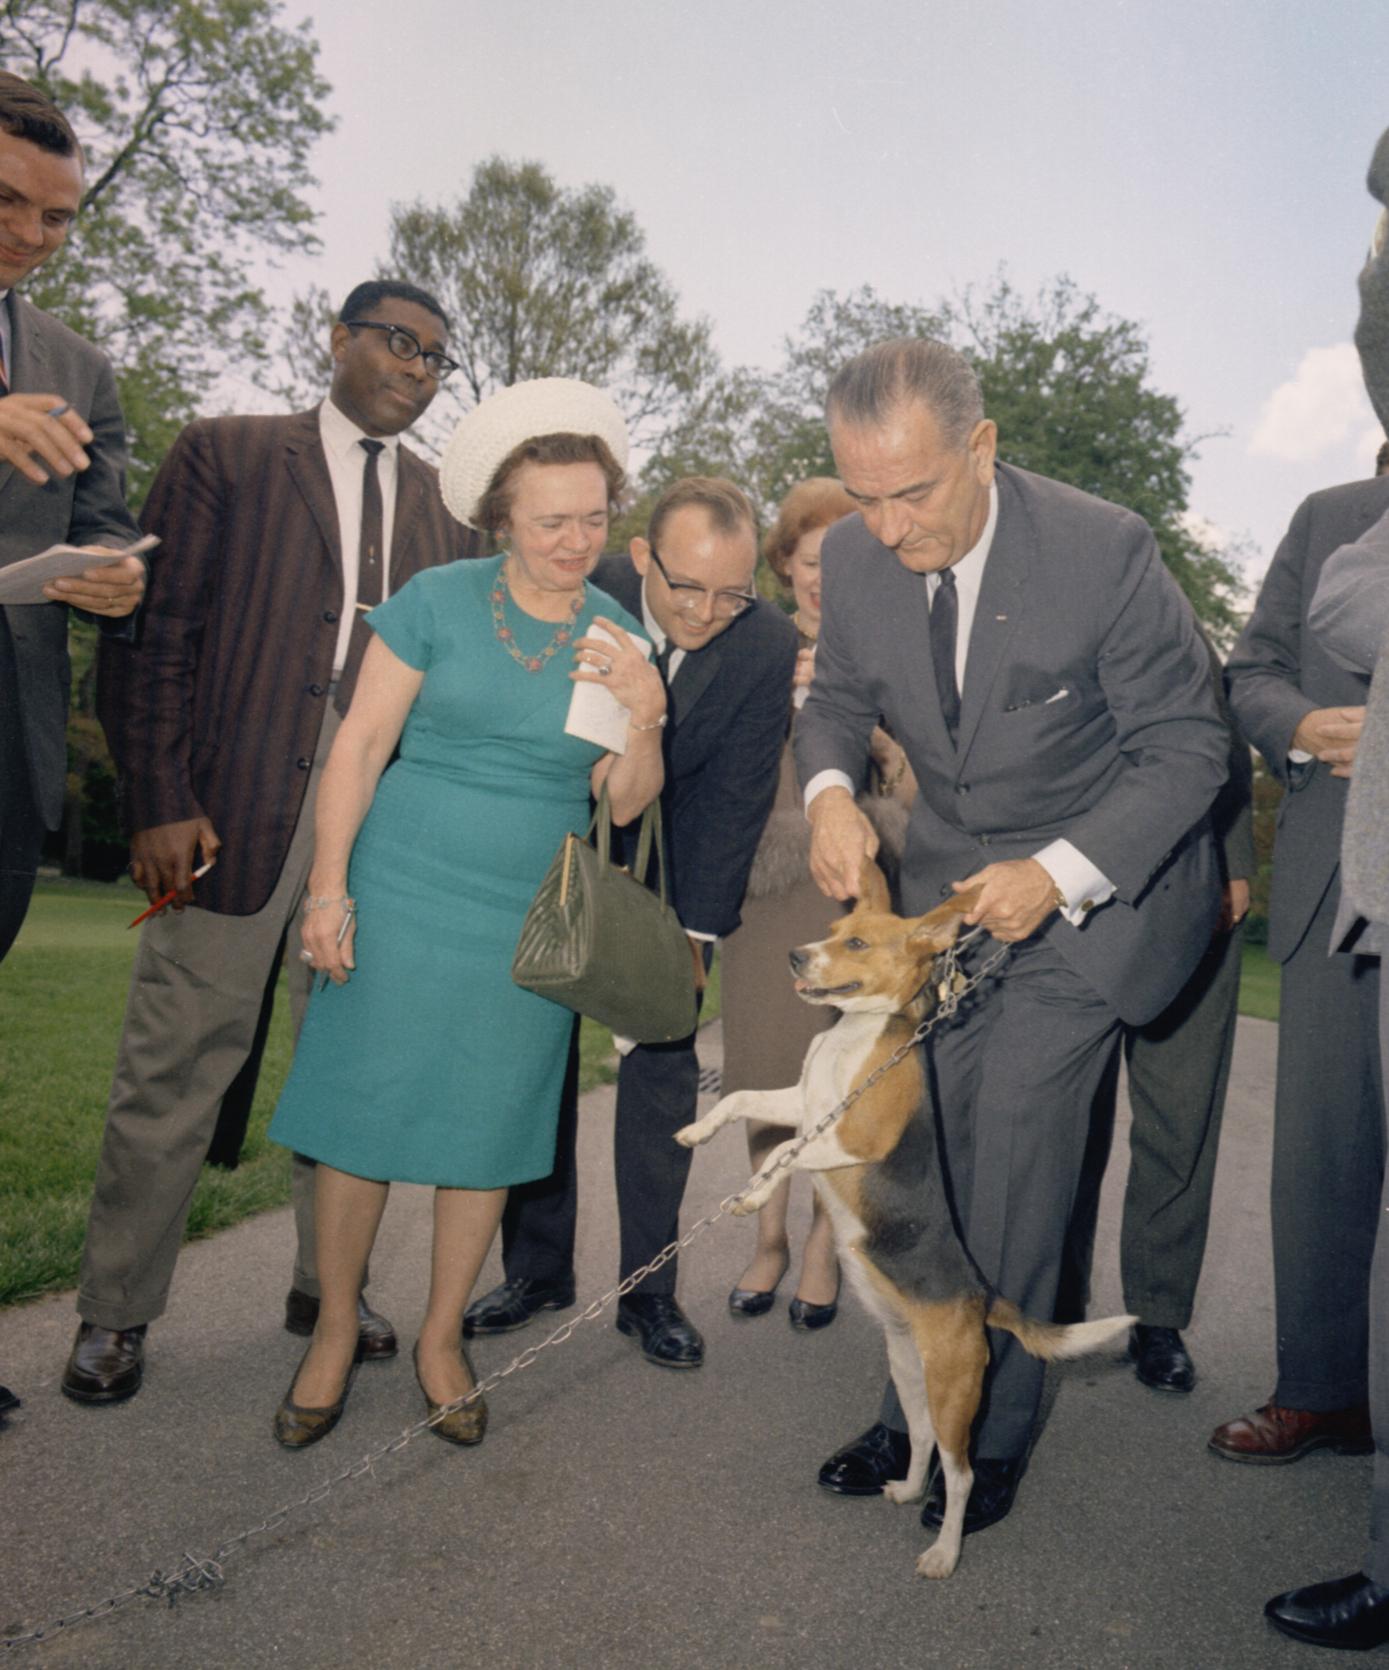 File:LBJ Lifts Dog By Ears-C311-7-64.jpg - Wikimedia Commons